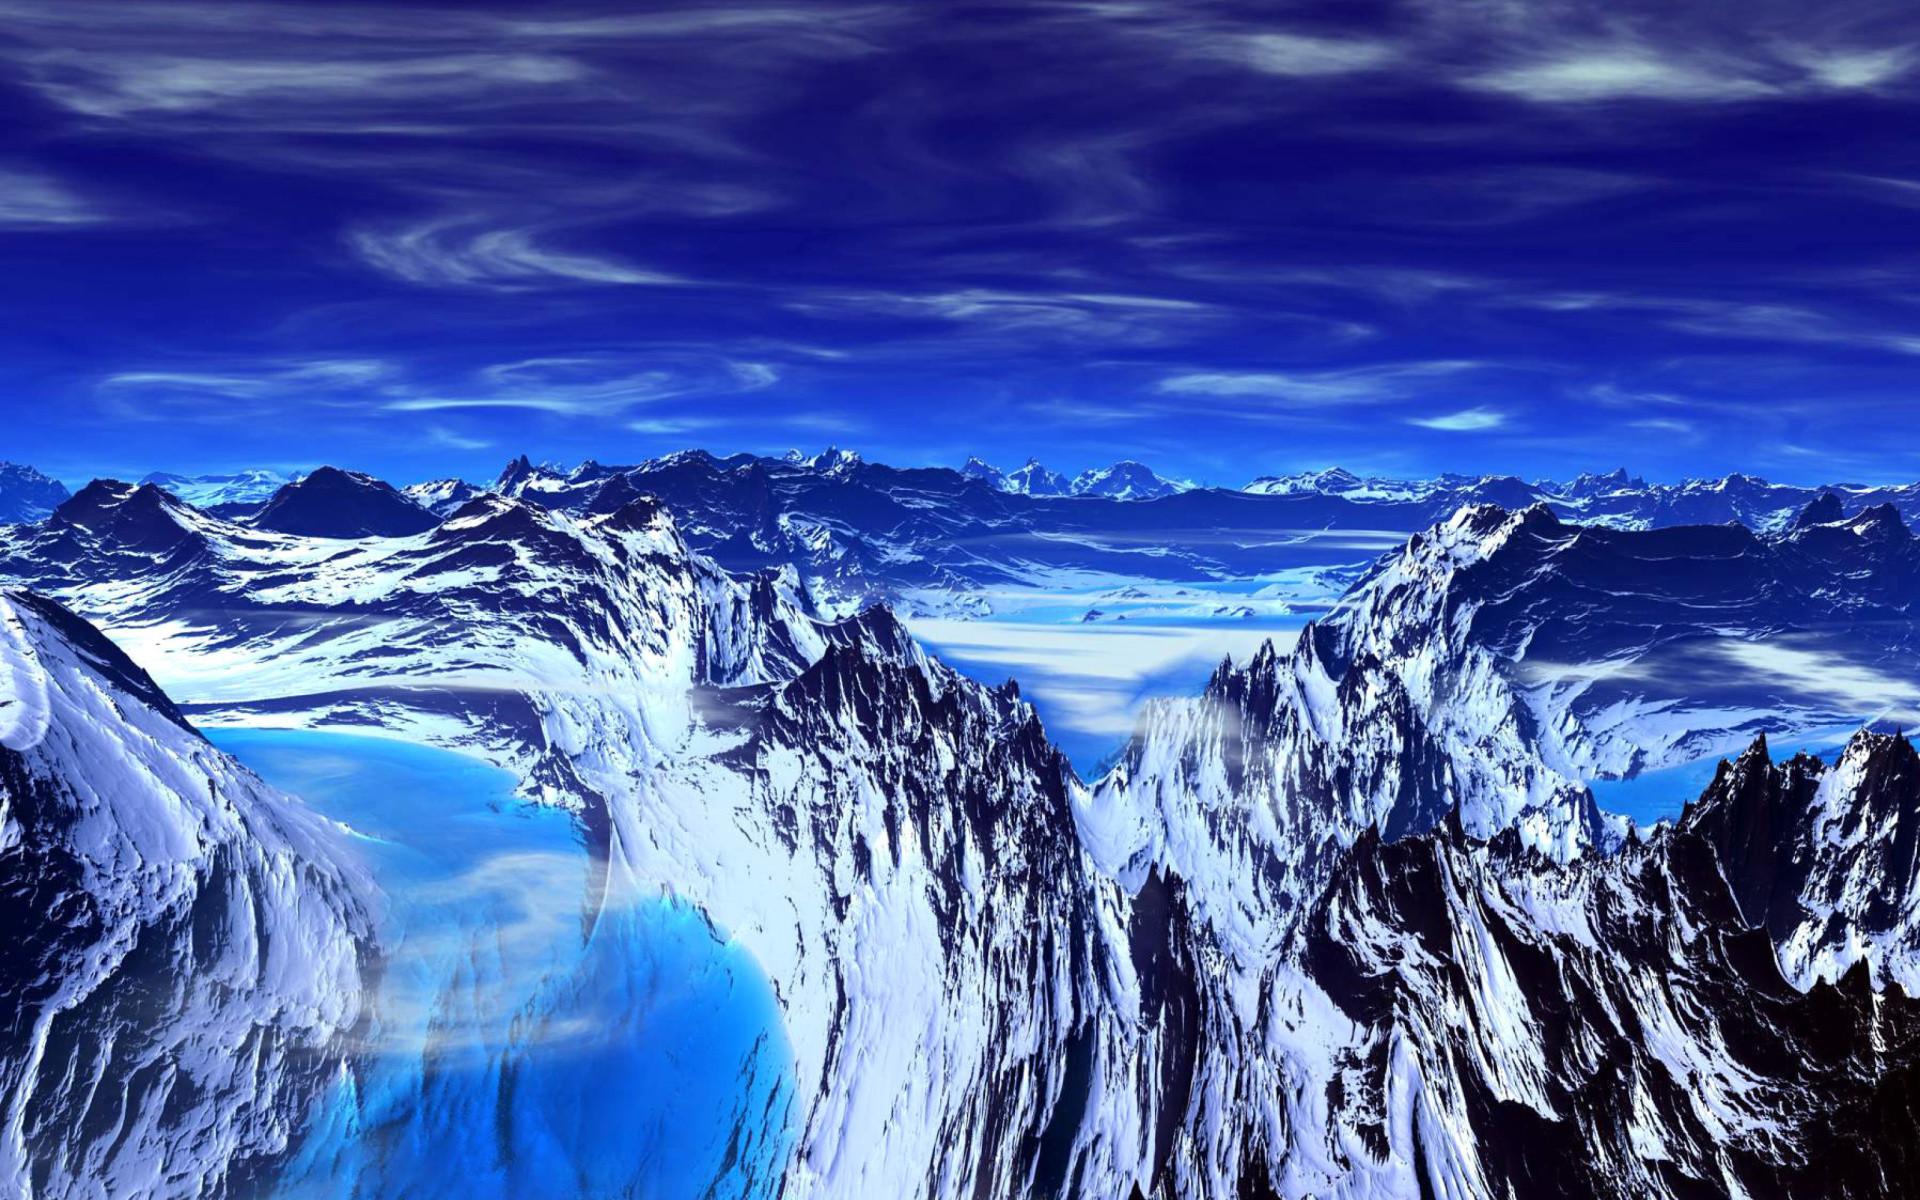 Blue Mountain Wallpaper for Widescreen Desktop PC 1920×1080 Full HD